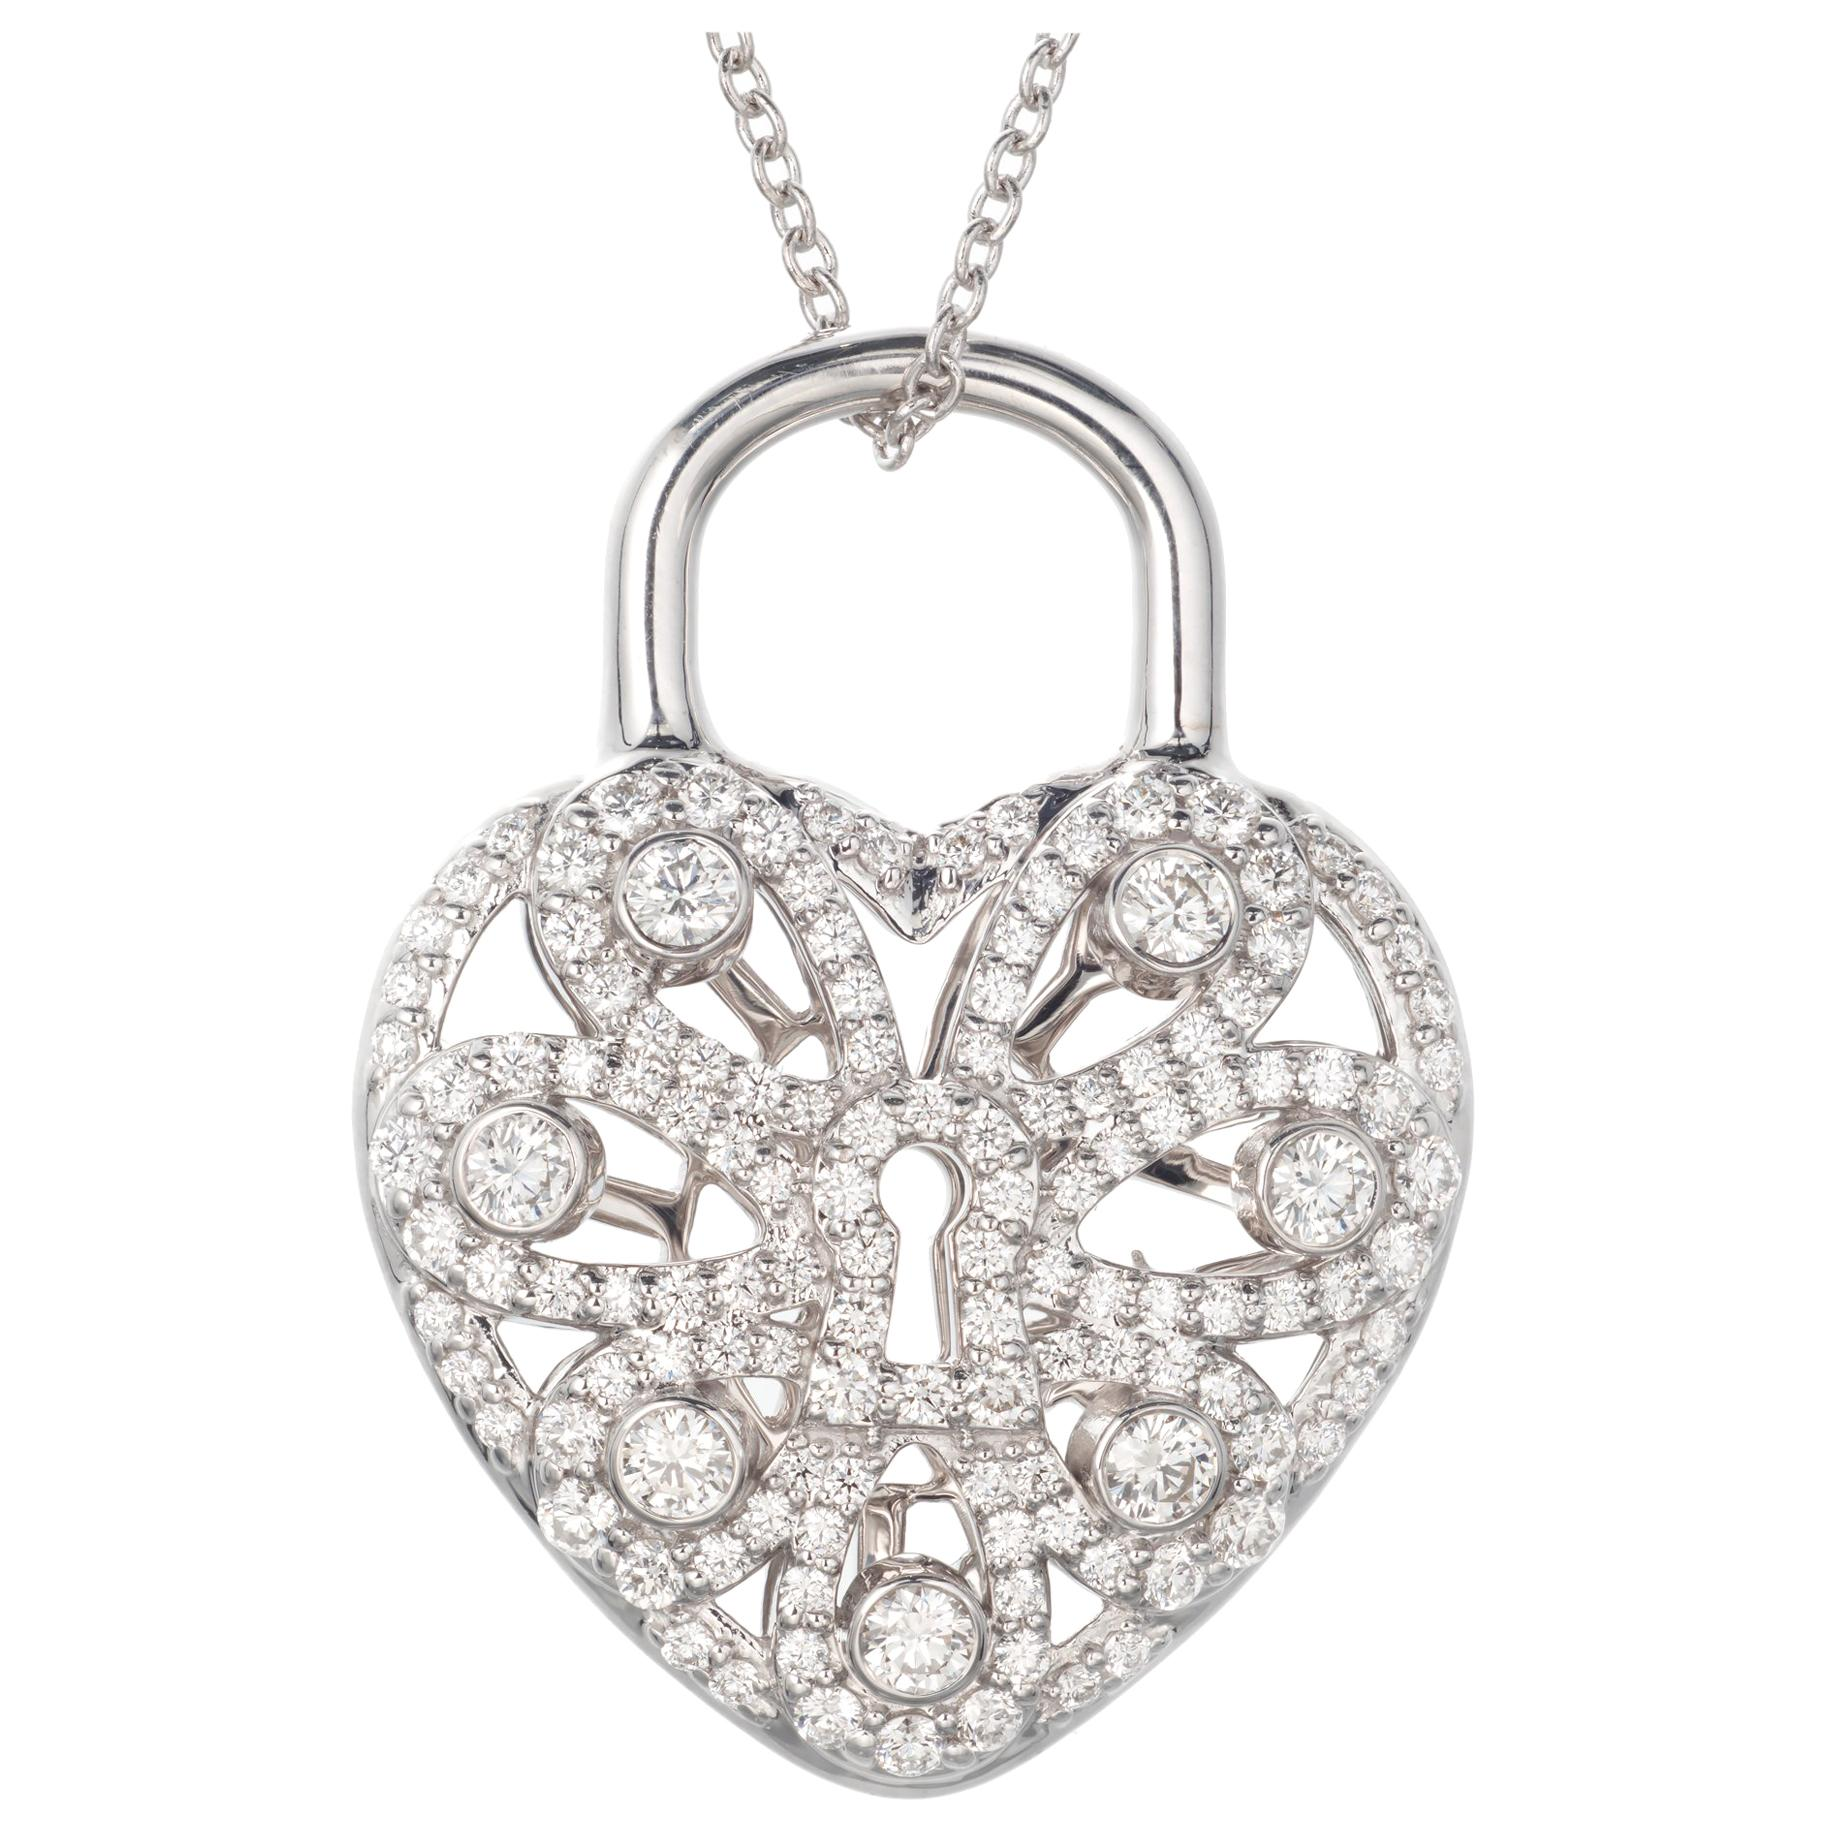 Tiffany & Co .90 Carat Diamond White Gold Heart Locket Pendant Necklace